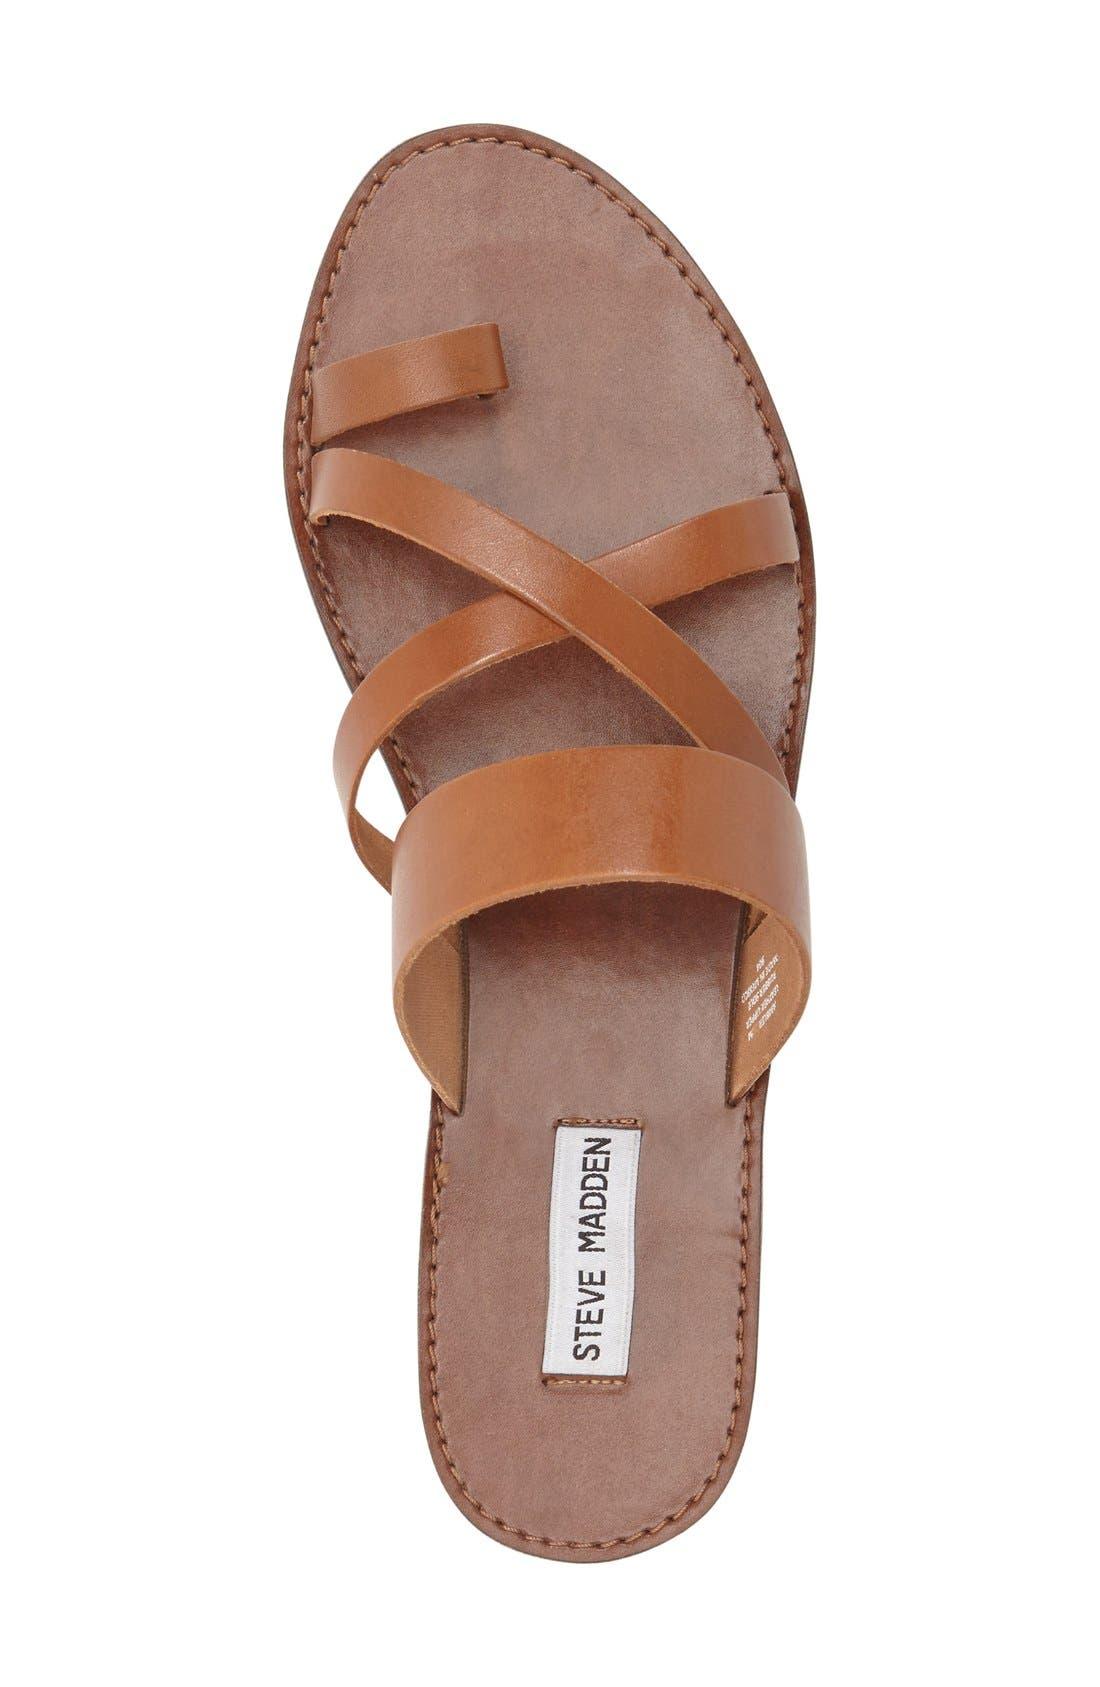 'Ambler' Sandal,                             Alternate thumbnail 3, color,                             Tan Leather